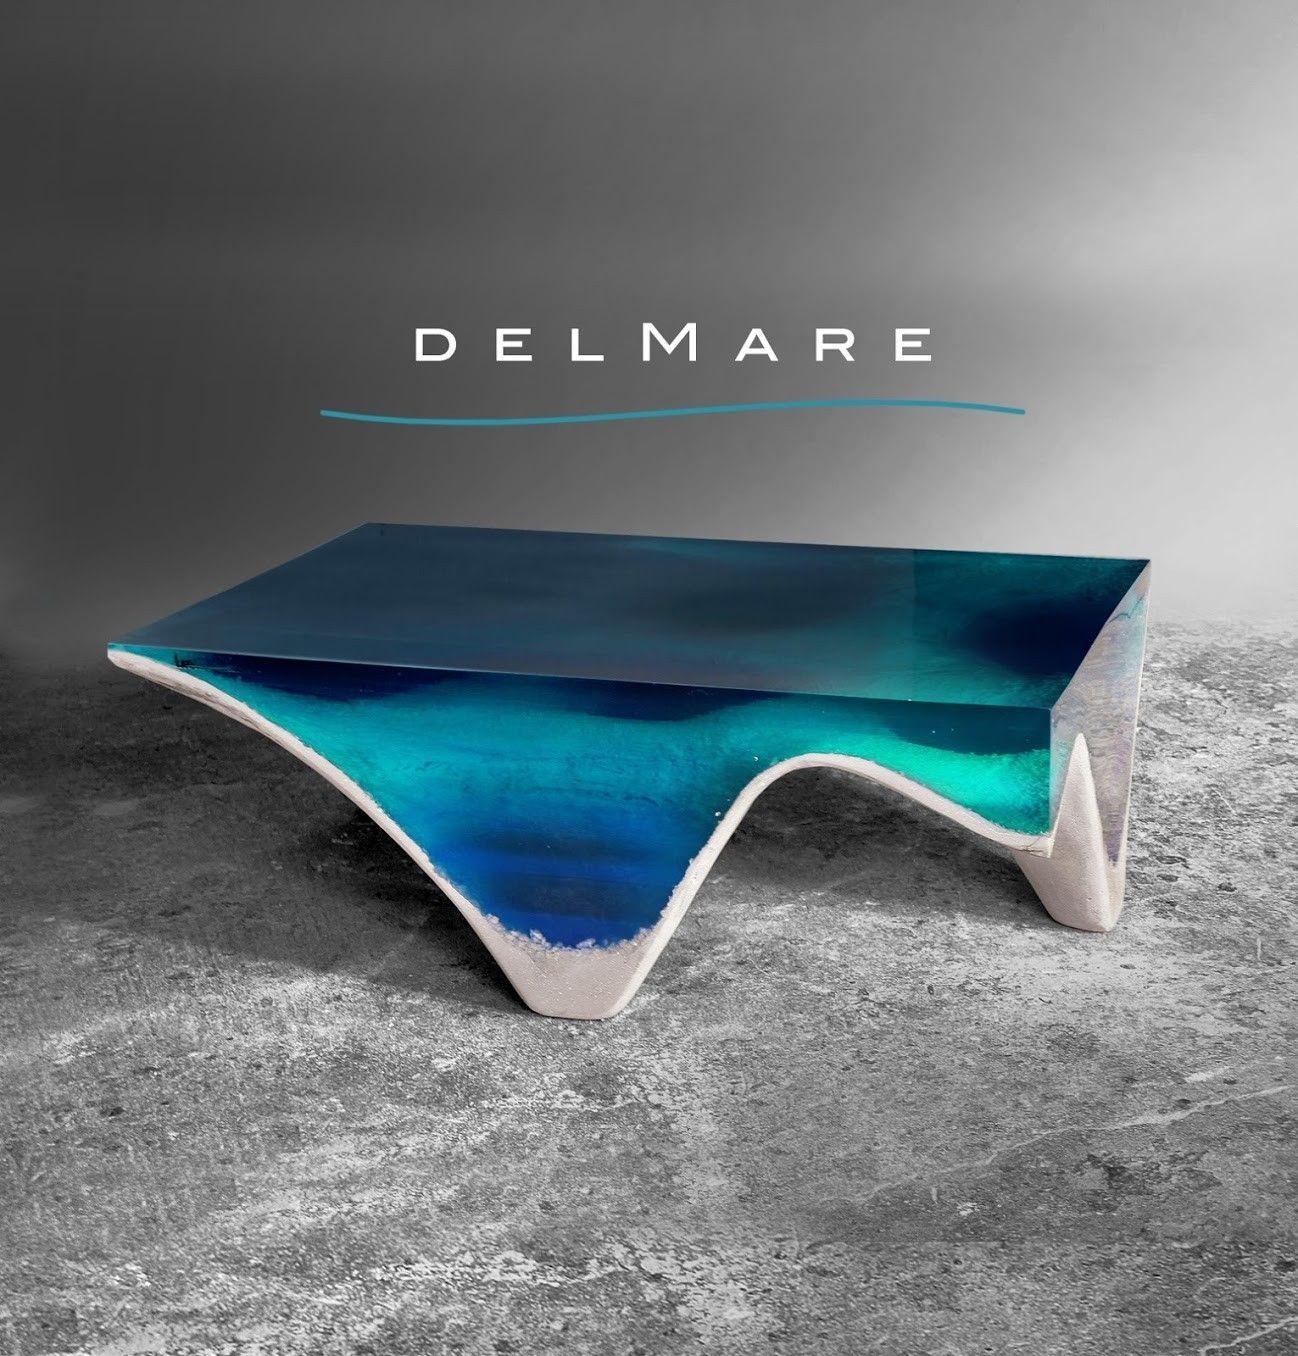 Table delmare en marbre et verre acrylique par eduard locota ...